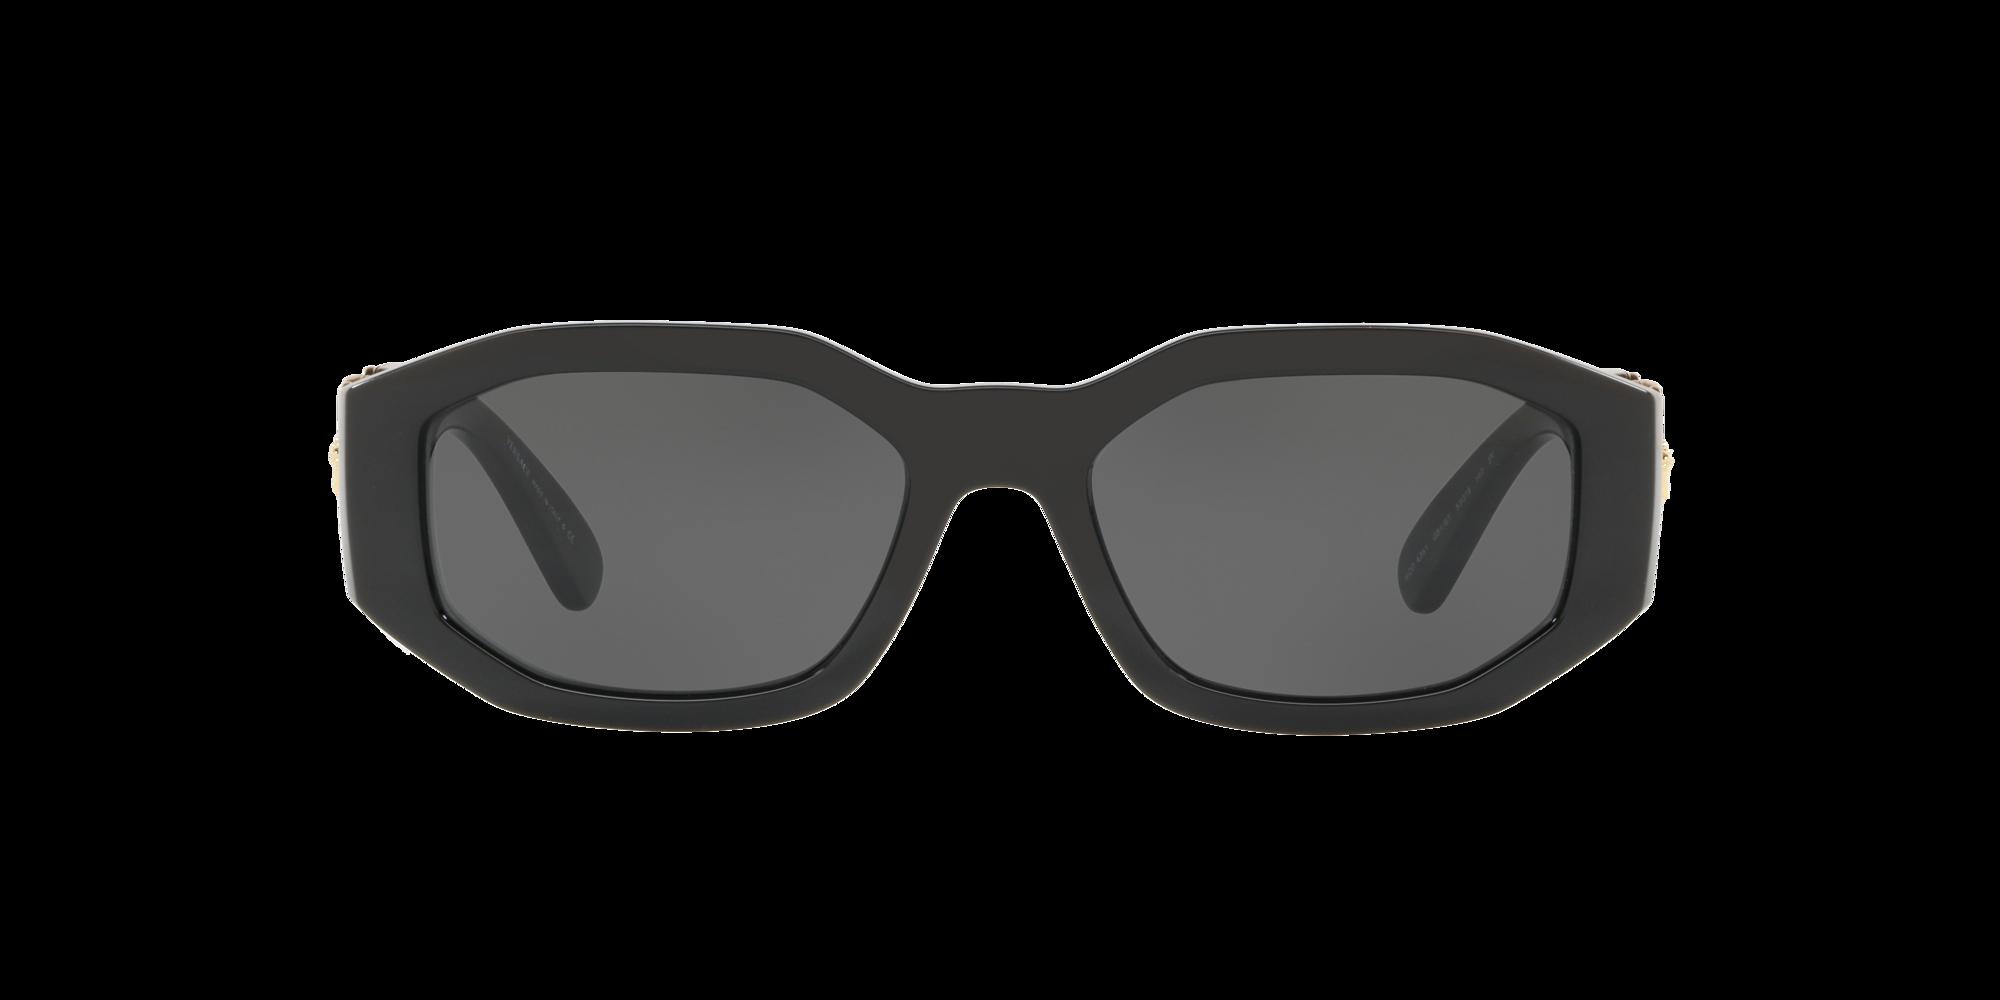 Image for VE4361 53 from LensCrafters   Glasses, Prescription Glasses Online, Eyewear